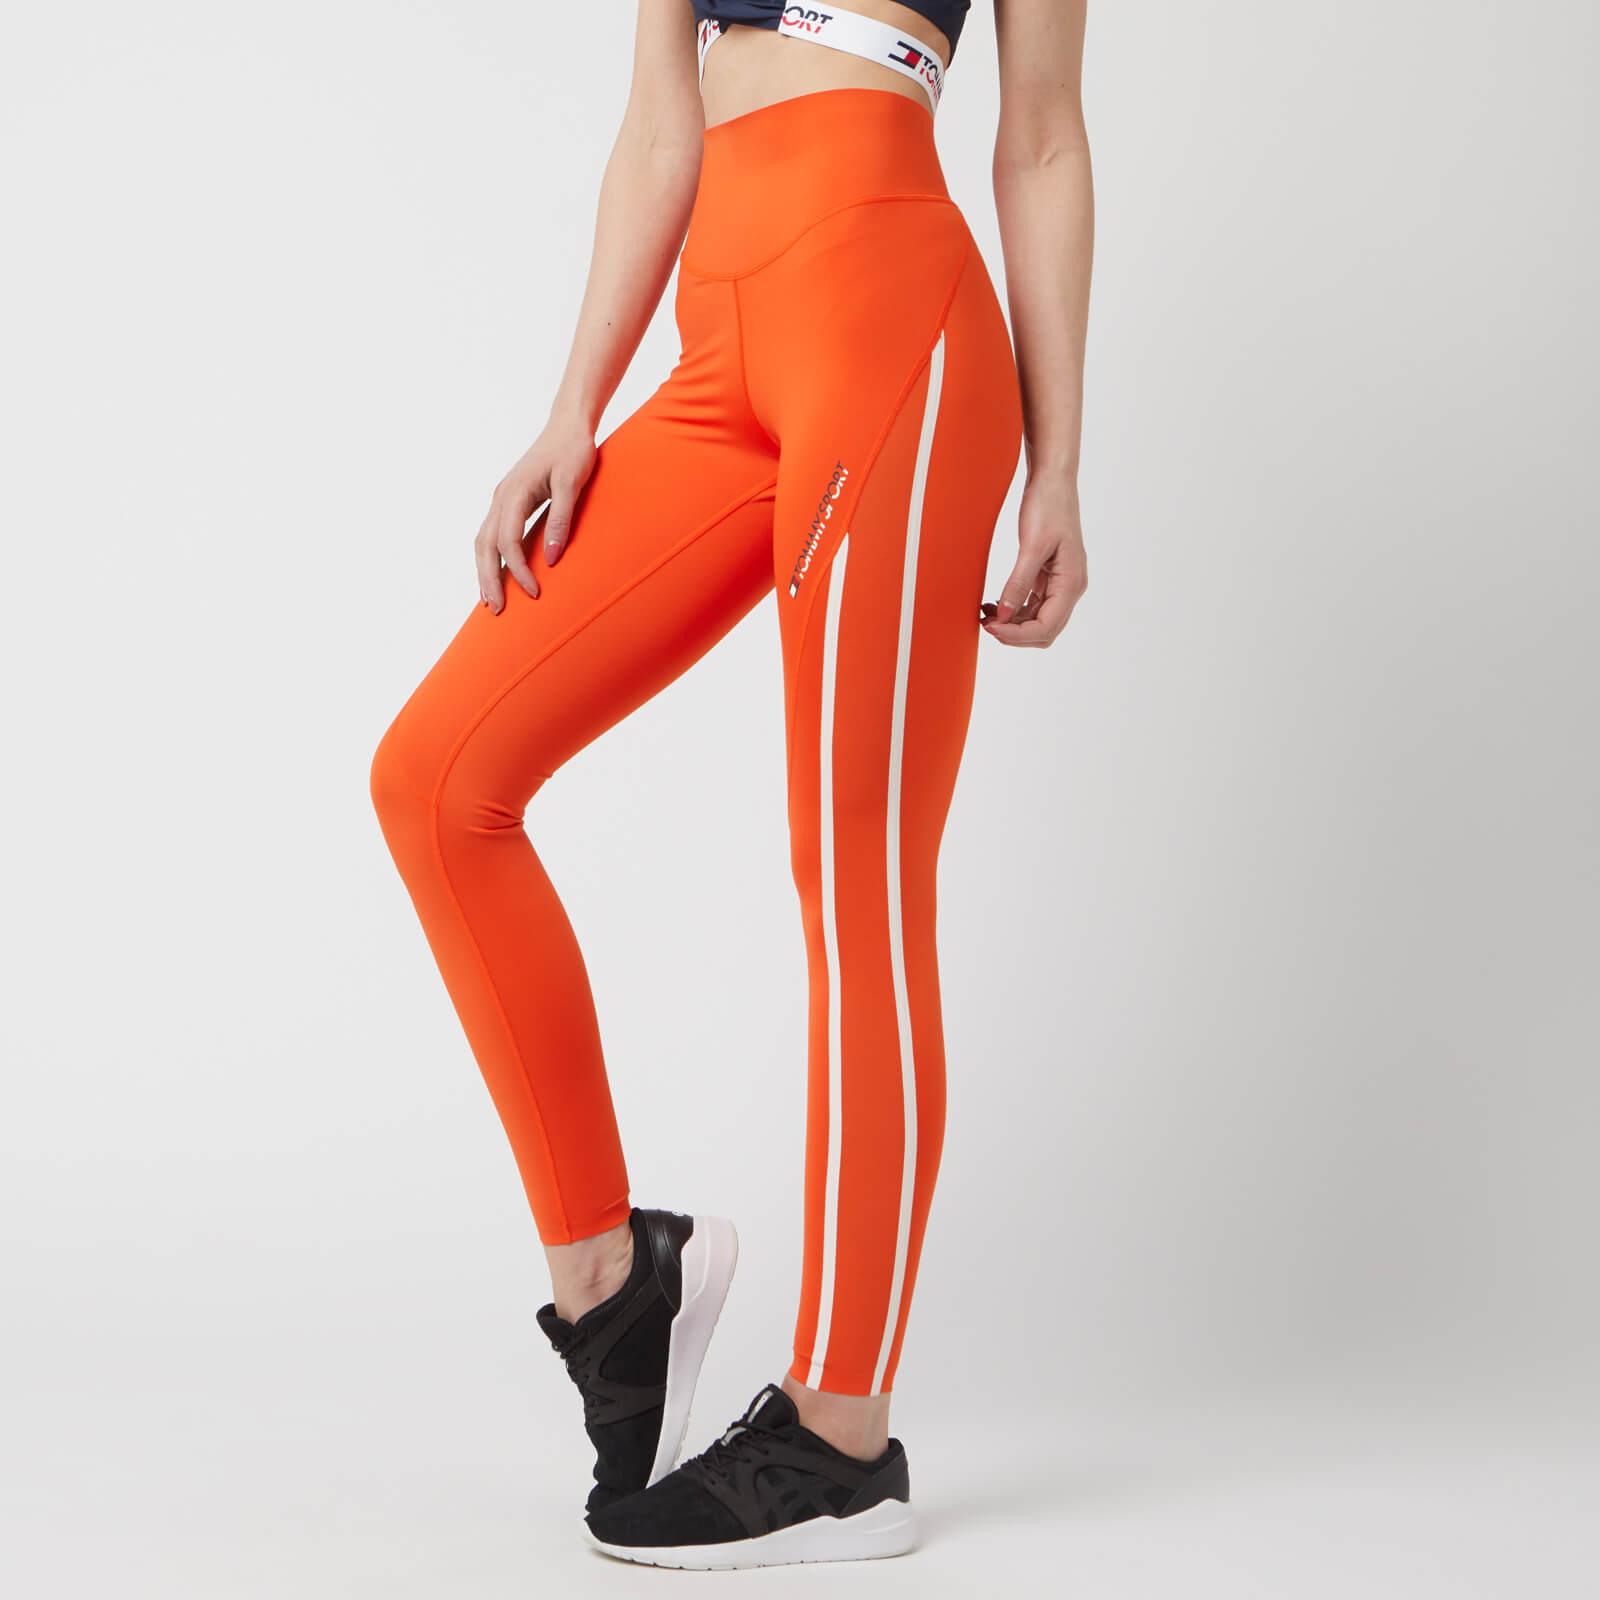 Tommy Hilfiger Sport Women's 220 High Waist Leggings - Cherry Tomato - S - Orange